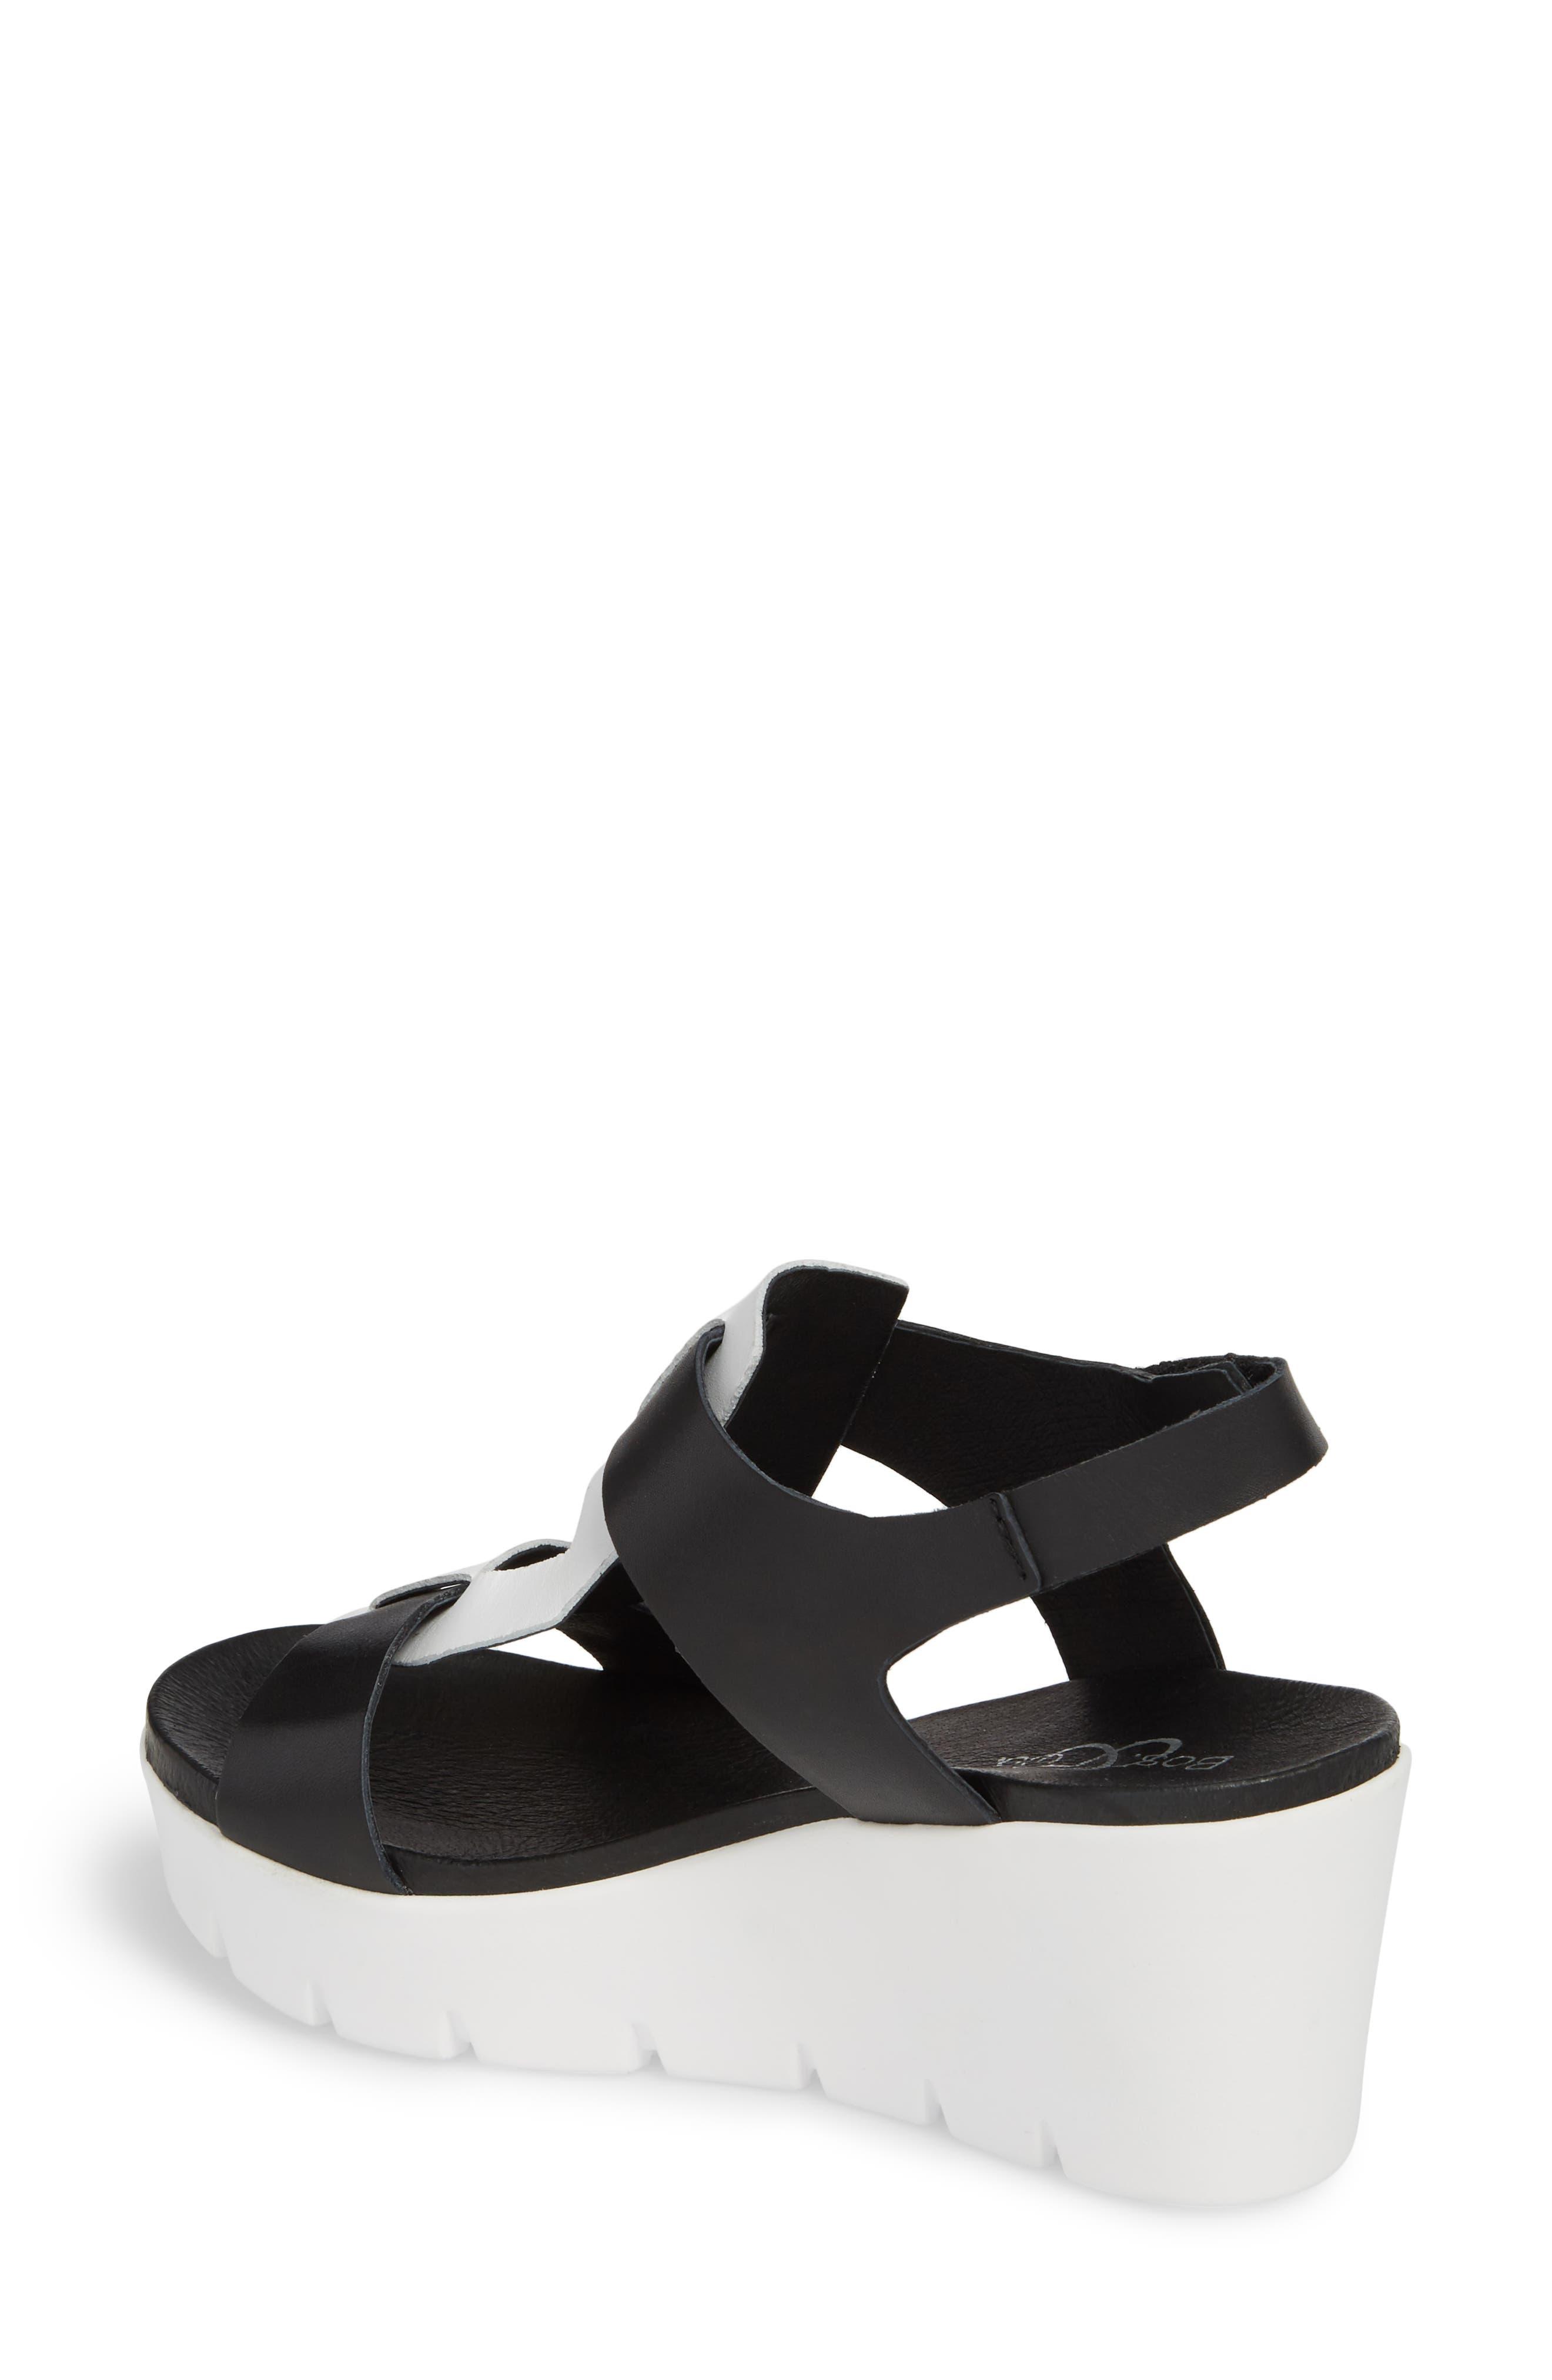 Somo Platform Wedge Sandal,                             Alternate thumbnail 2, color,                             BLACK/ WHITE SMOOTH LEATHER